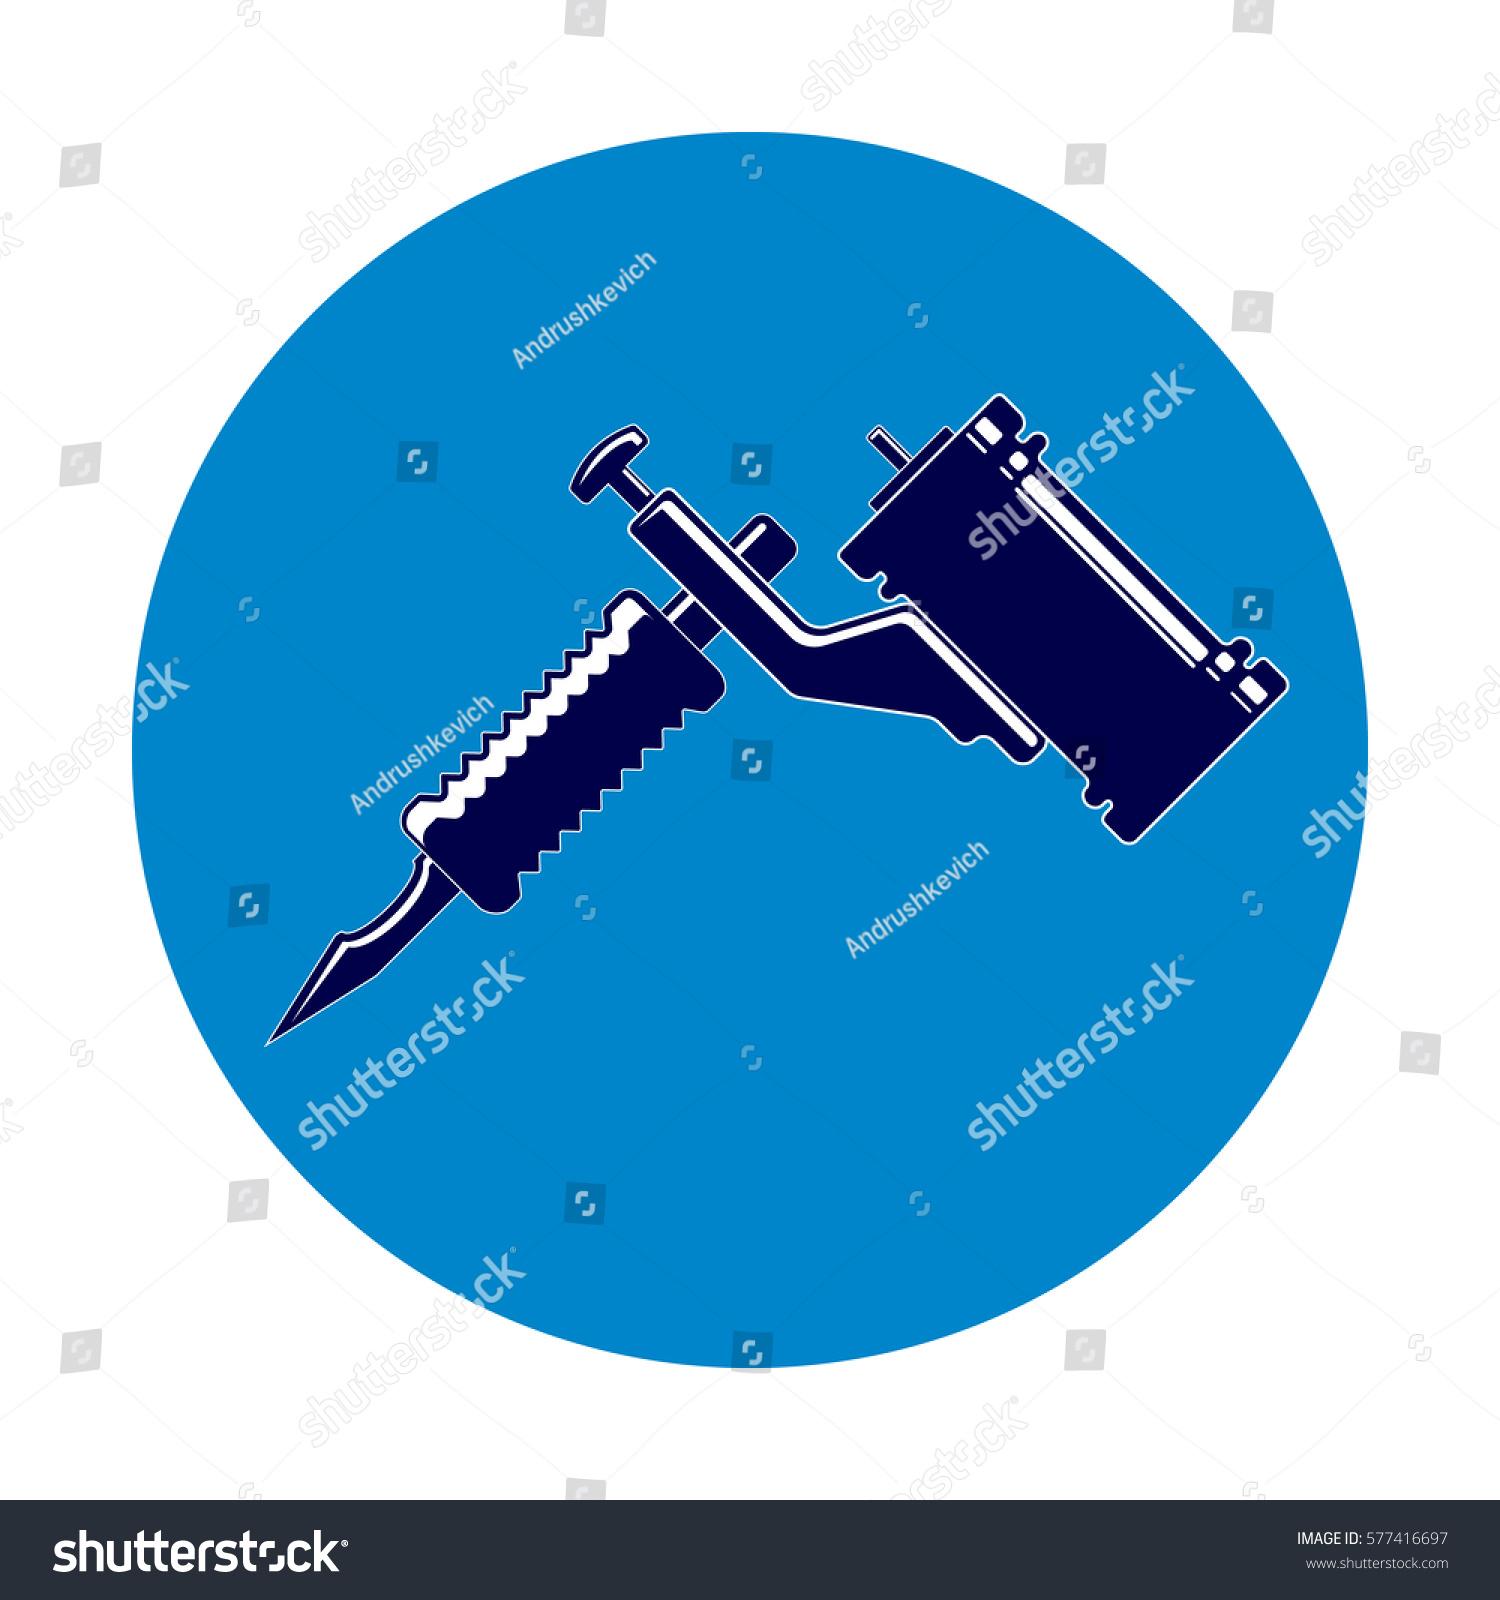 Icon Tattoo Machine Stock Vector Royalty Free 577416697 Shutterstock Diagram